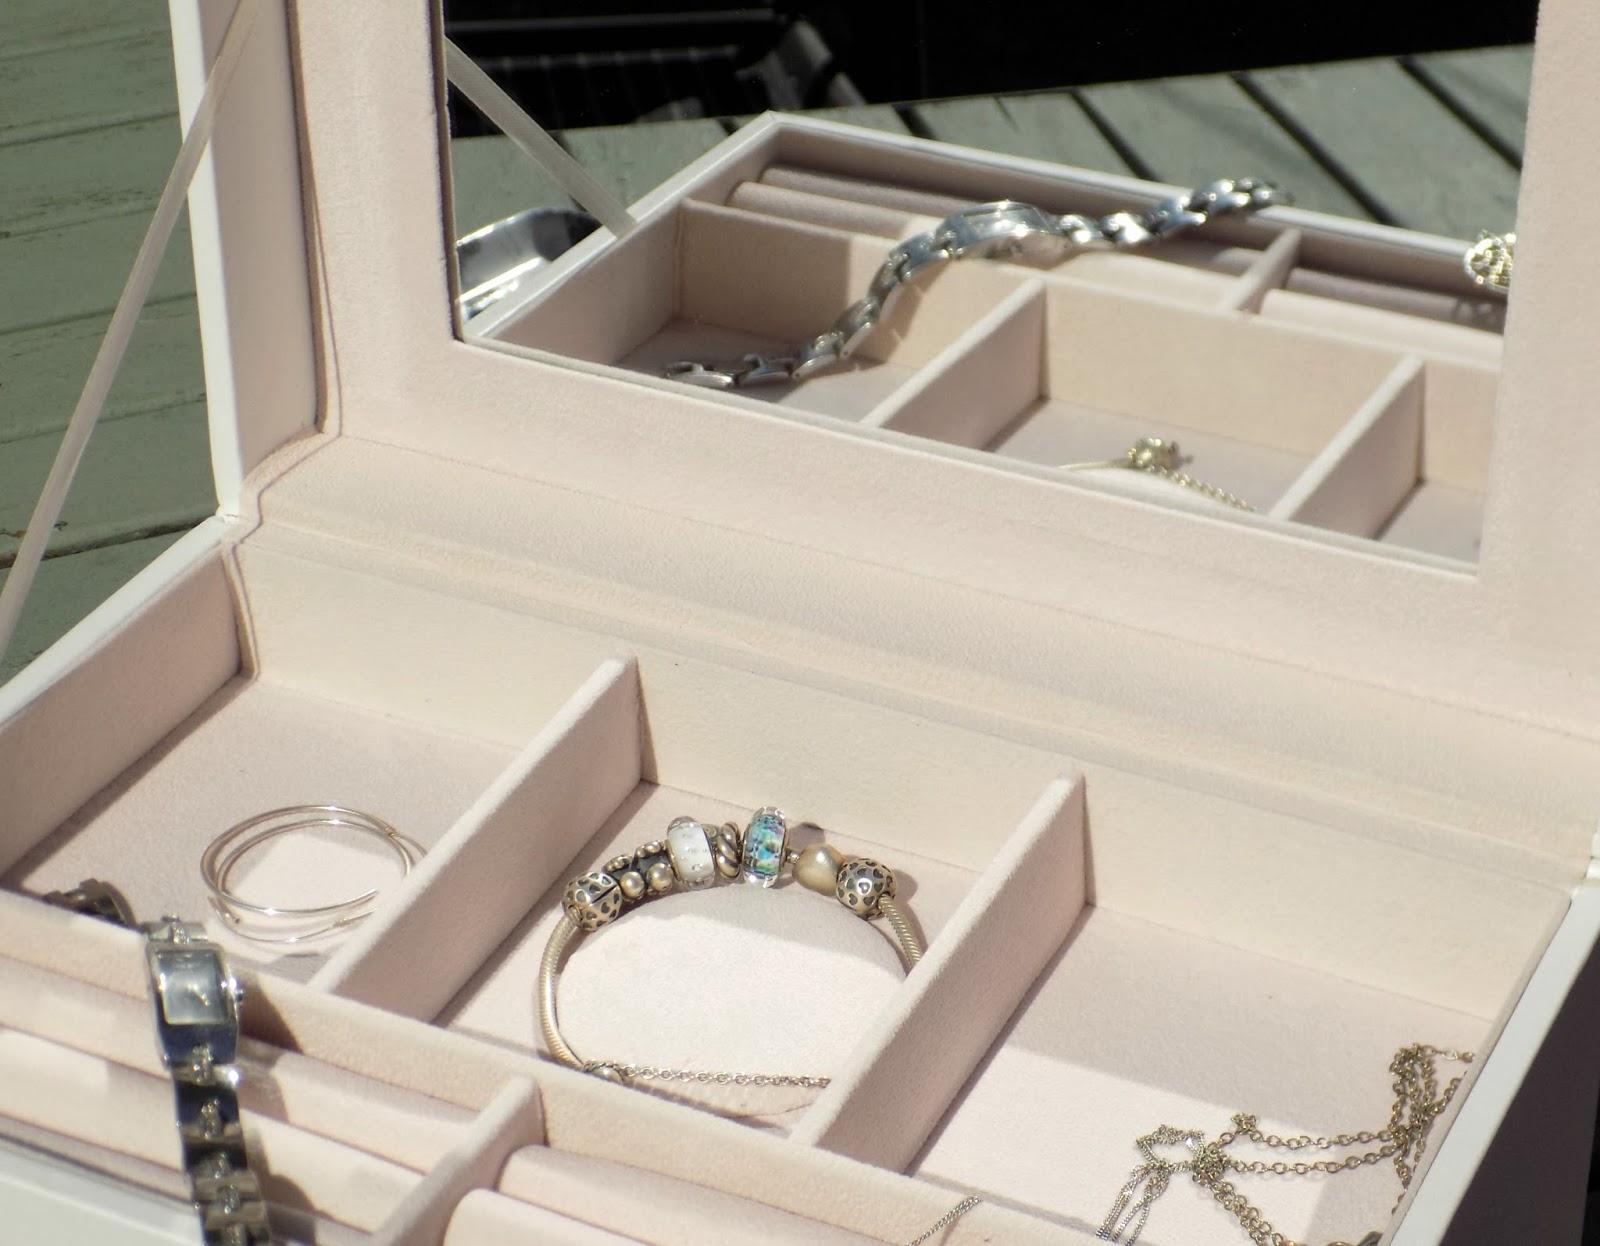 Songmics faux leather jewellery box